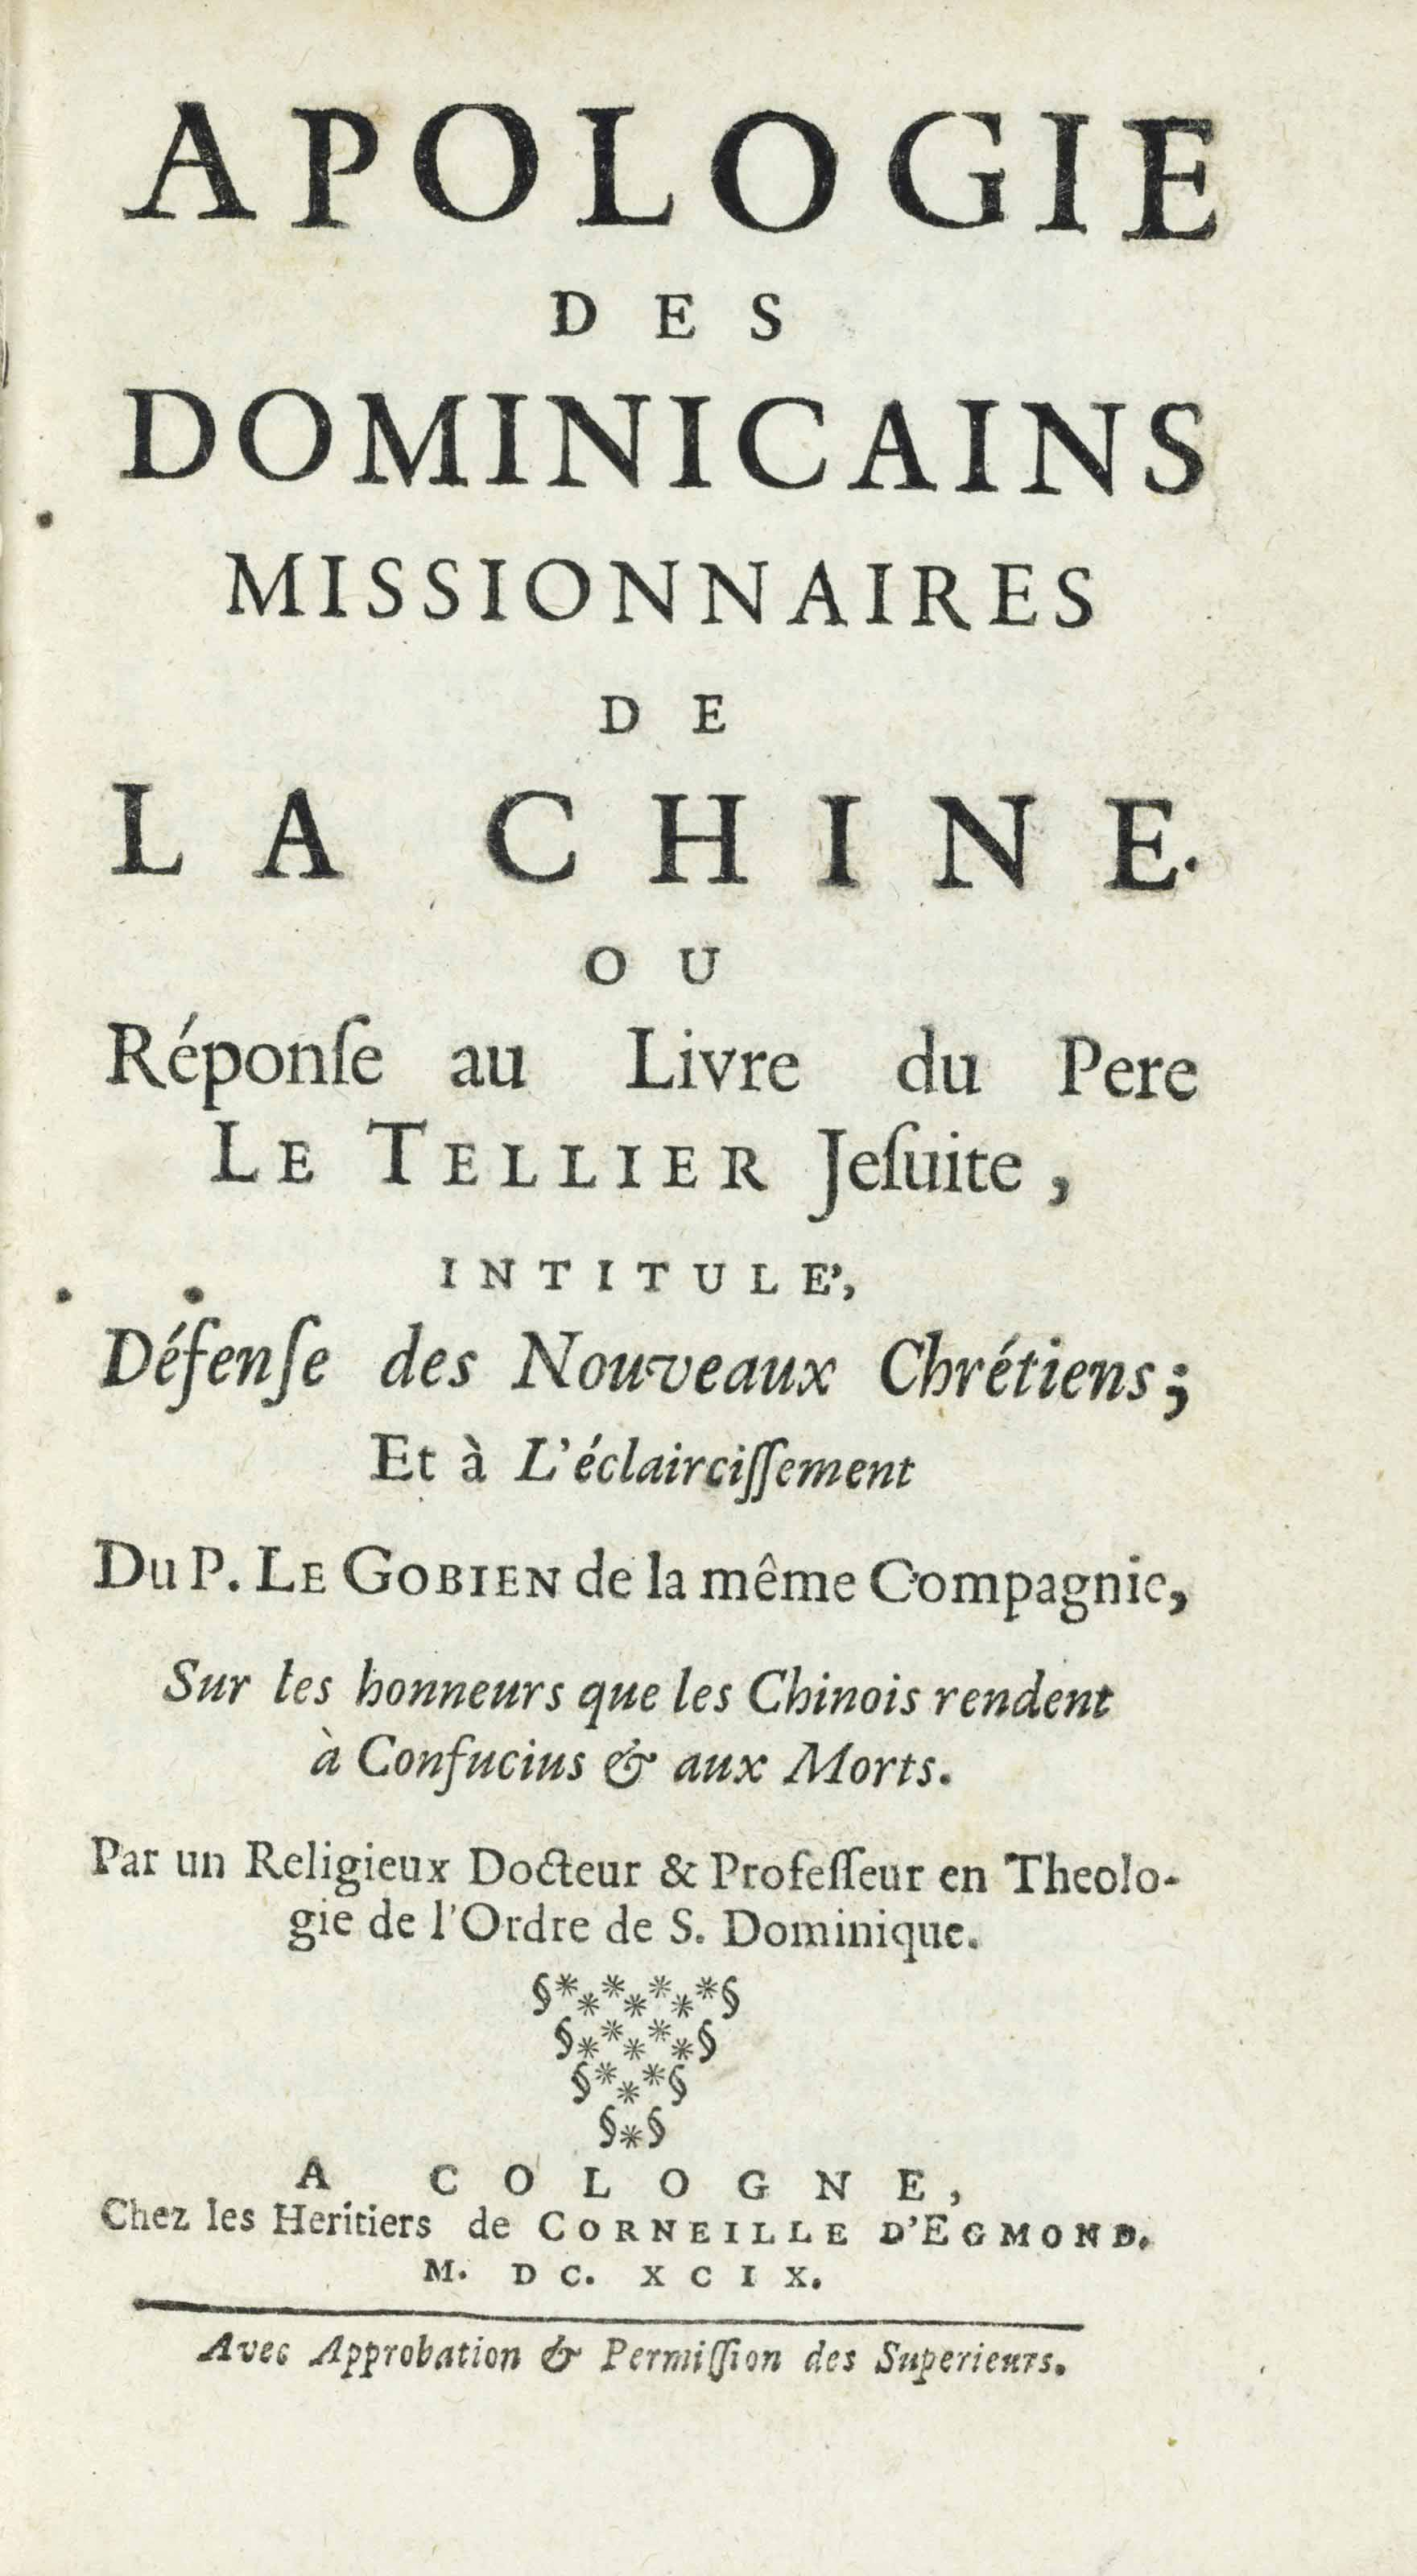 ALEXANDRE, Noel (1639-1724). A